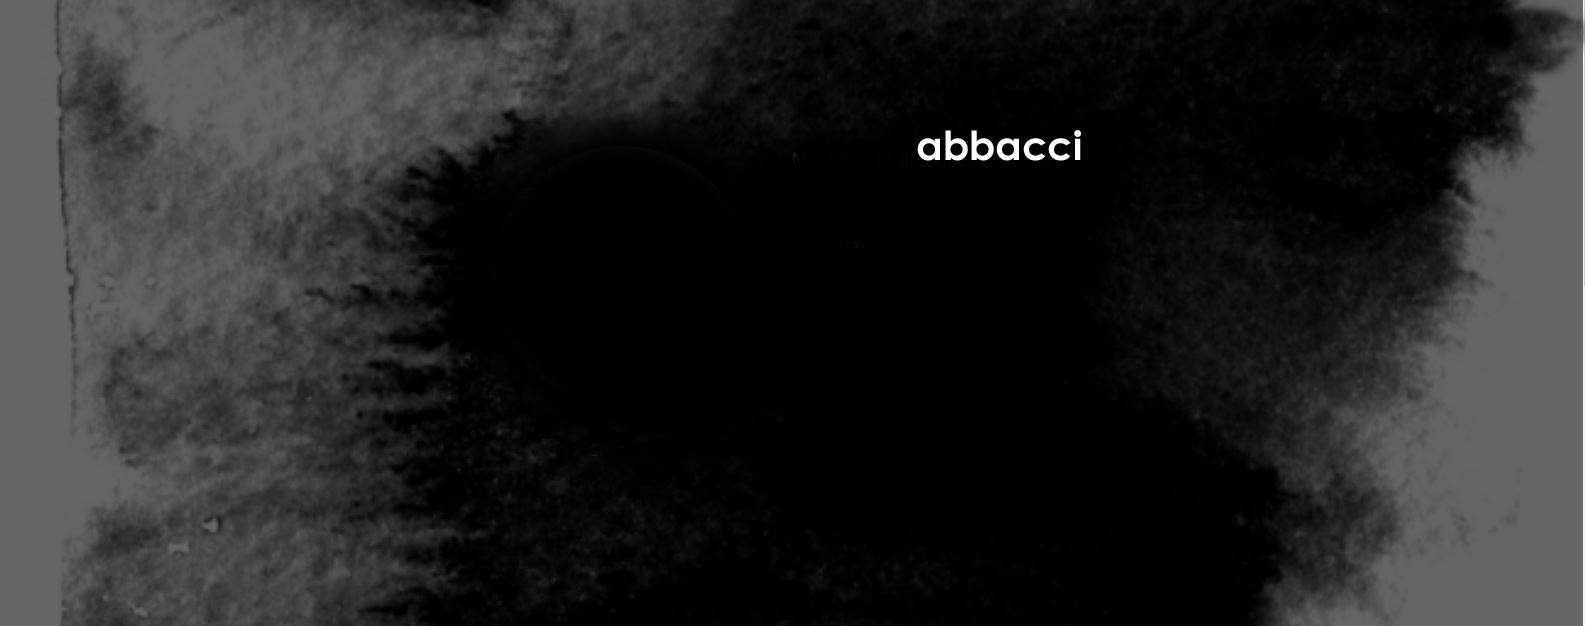 Mushima N. (@abbacci) Cover Image